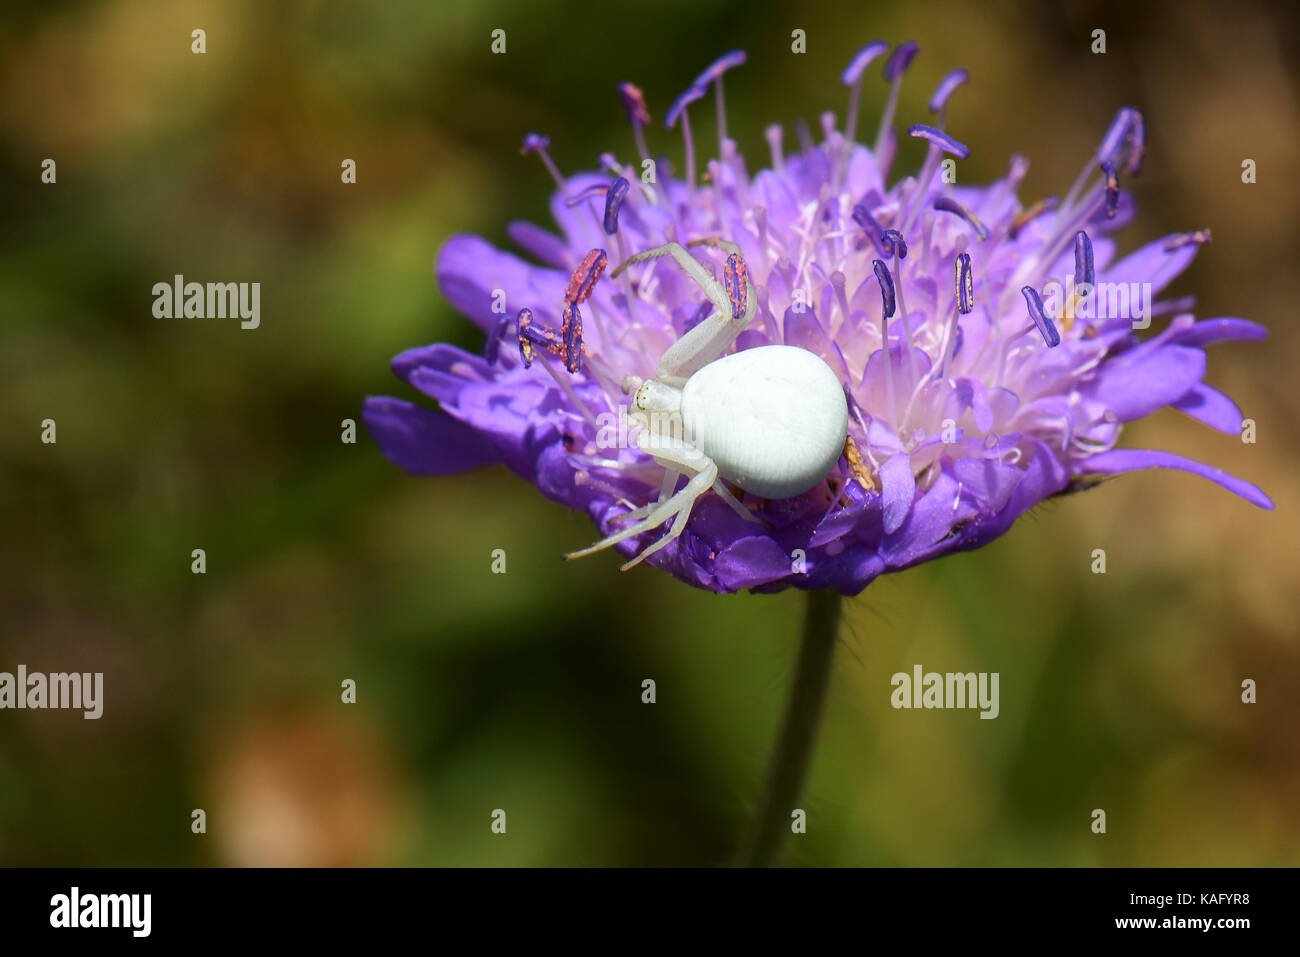 Goldenrod Crab Spider (Misumena vatia) on a Scabious flower - Stock Image